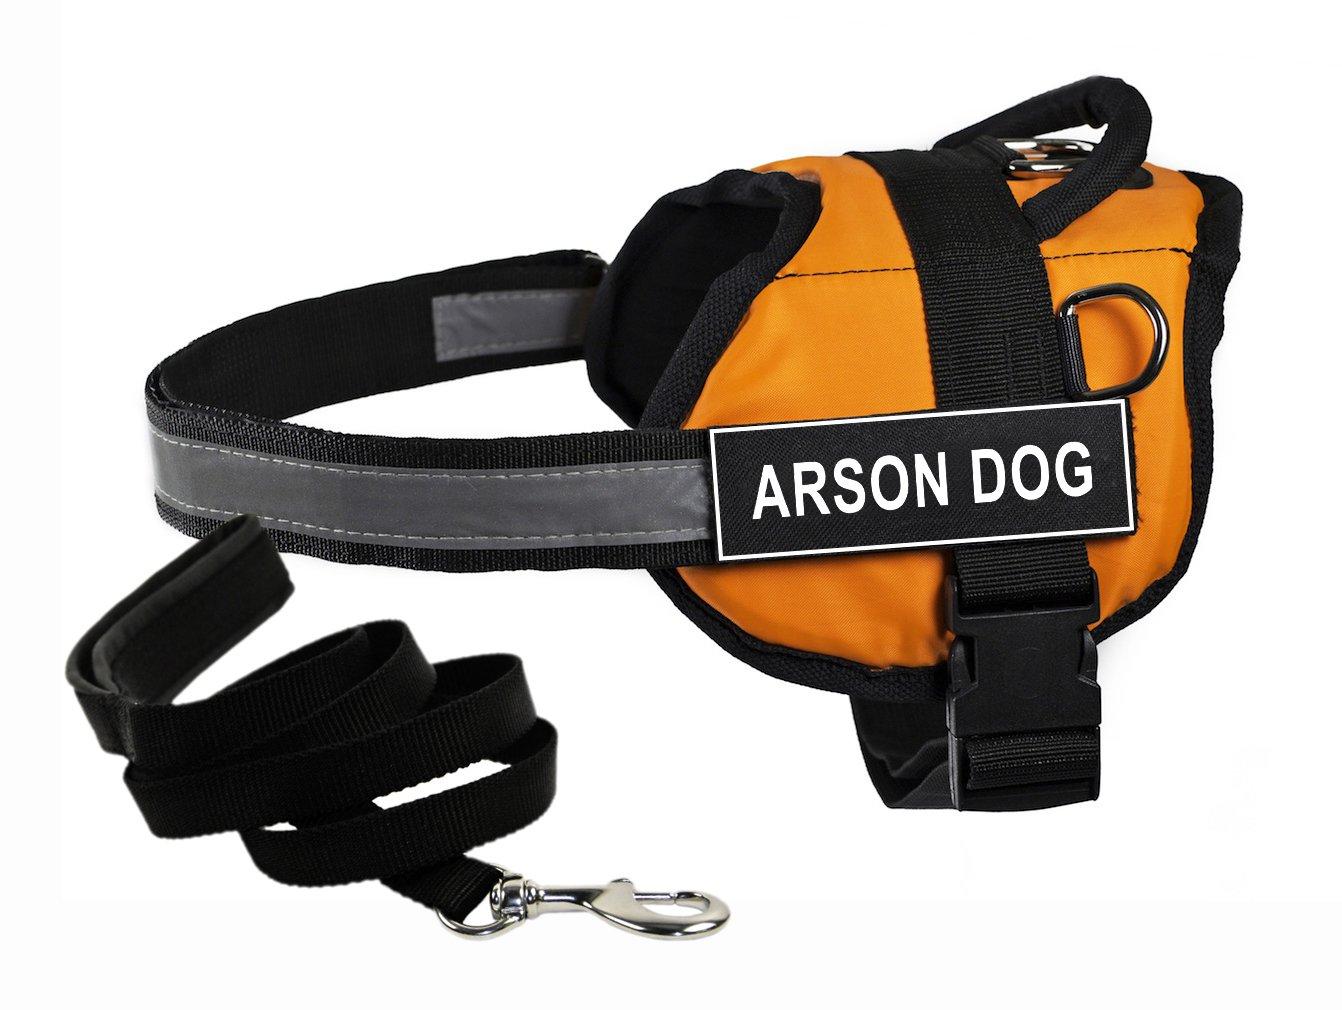 Dean & Tyler DT Works arancia Arson Dog Torace Imbracatura con Imbottitura, Medium e Nero 1,8 m Padded Puppy guinzaglio.